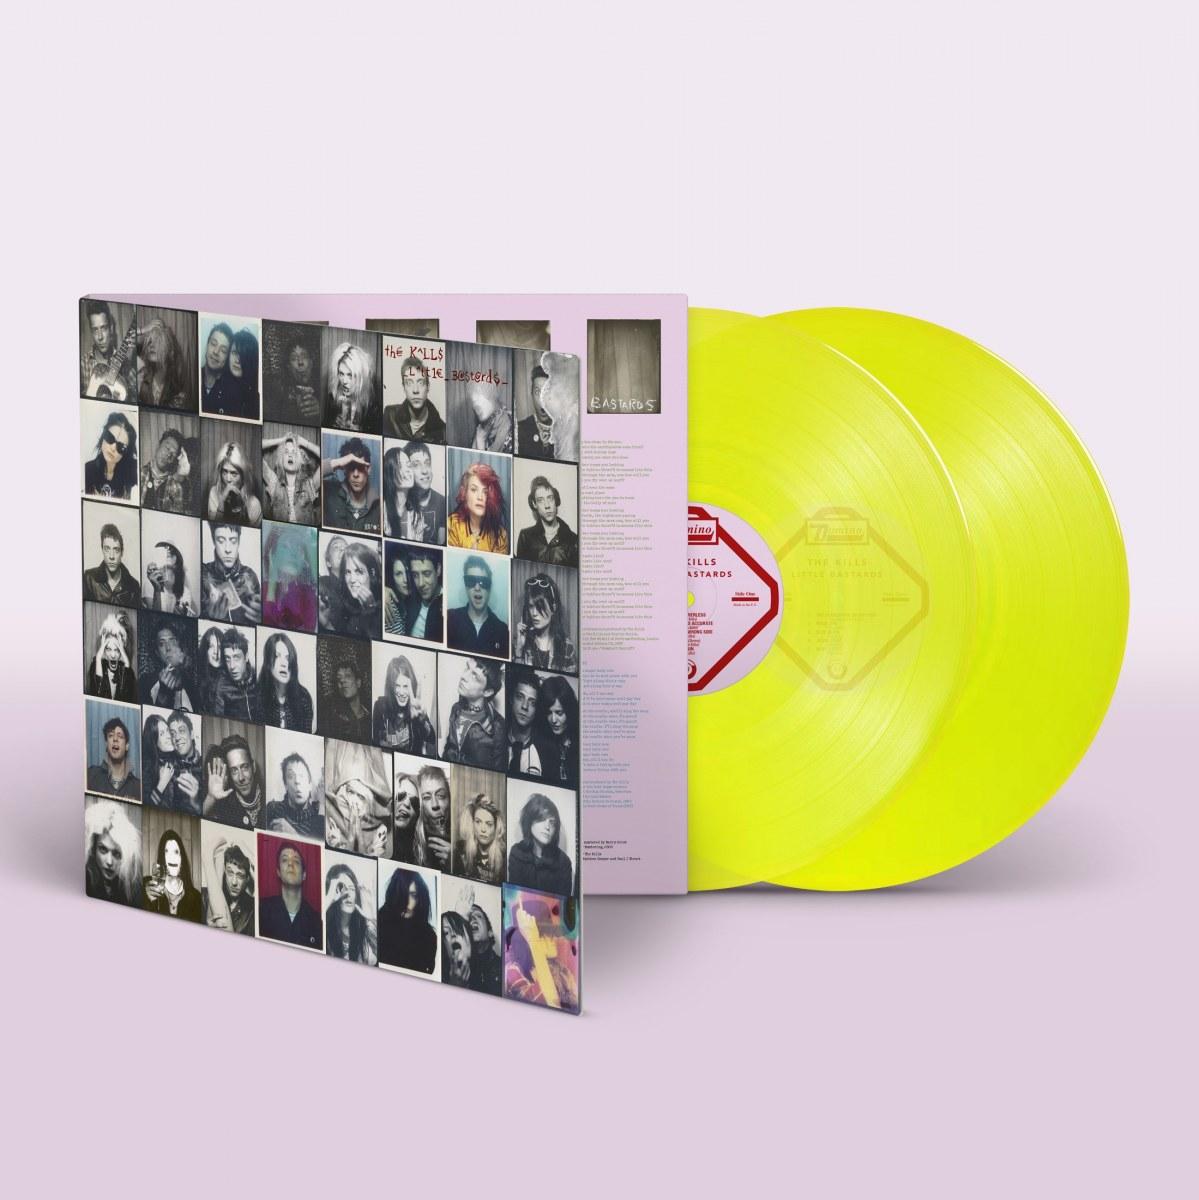 The Kills little bastards rarities album artwork raise me vinyl